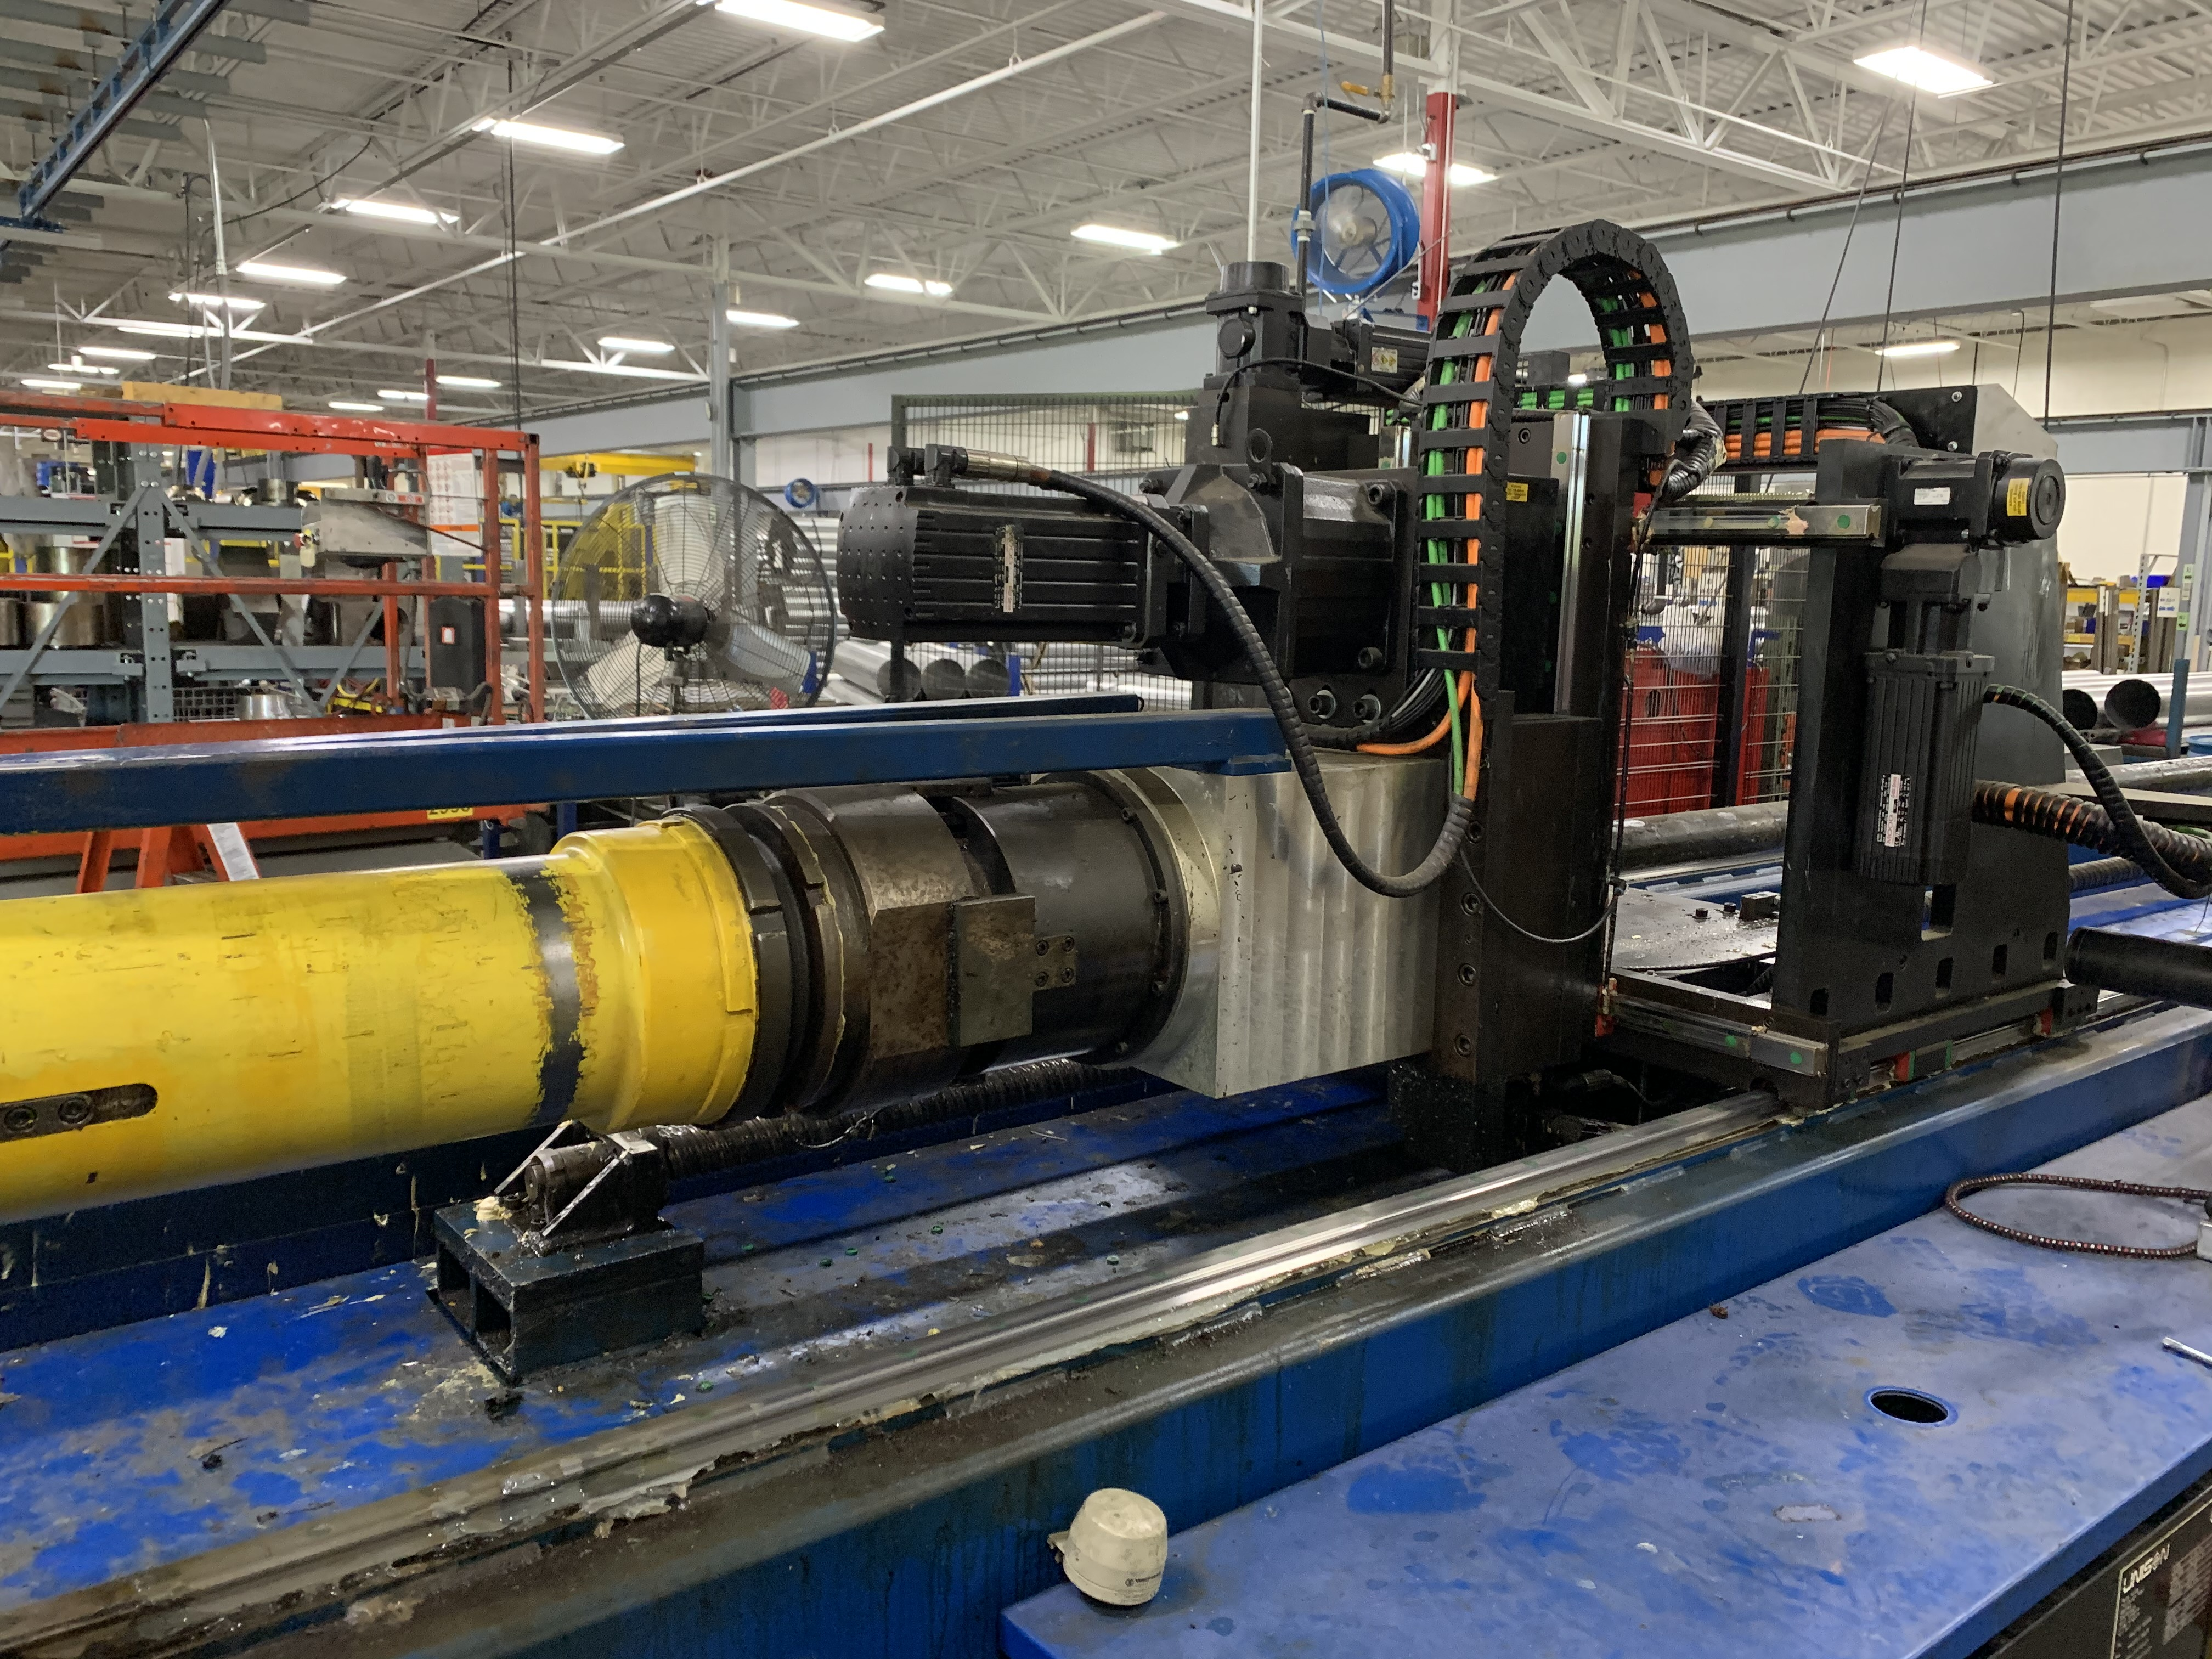 "6"" UNISON MODEL 6"" MS RH ELECTRIC CNC MULTI-STACK TUBE BENDER; S/N 2715, JOB NO. ME 4-410,(NEW 2014) - Image 29 of 72"